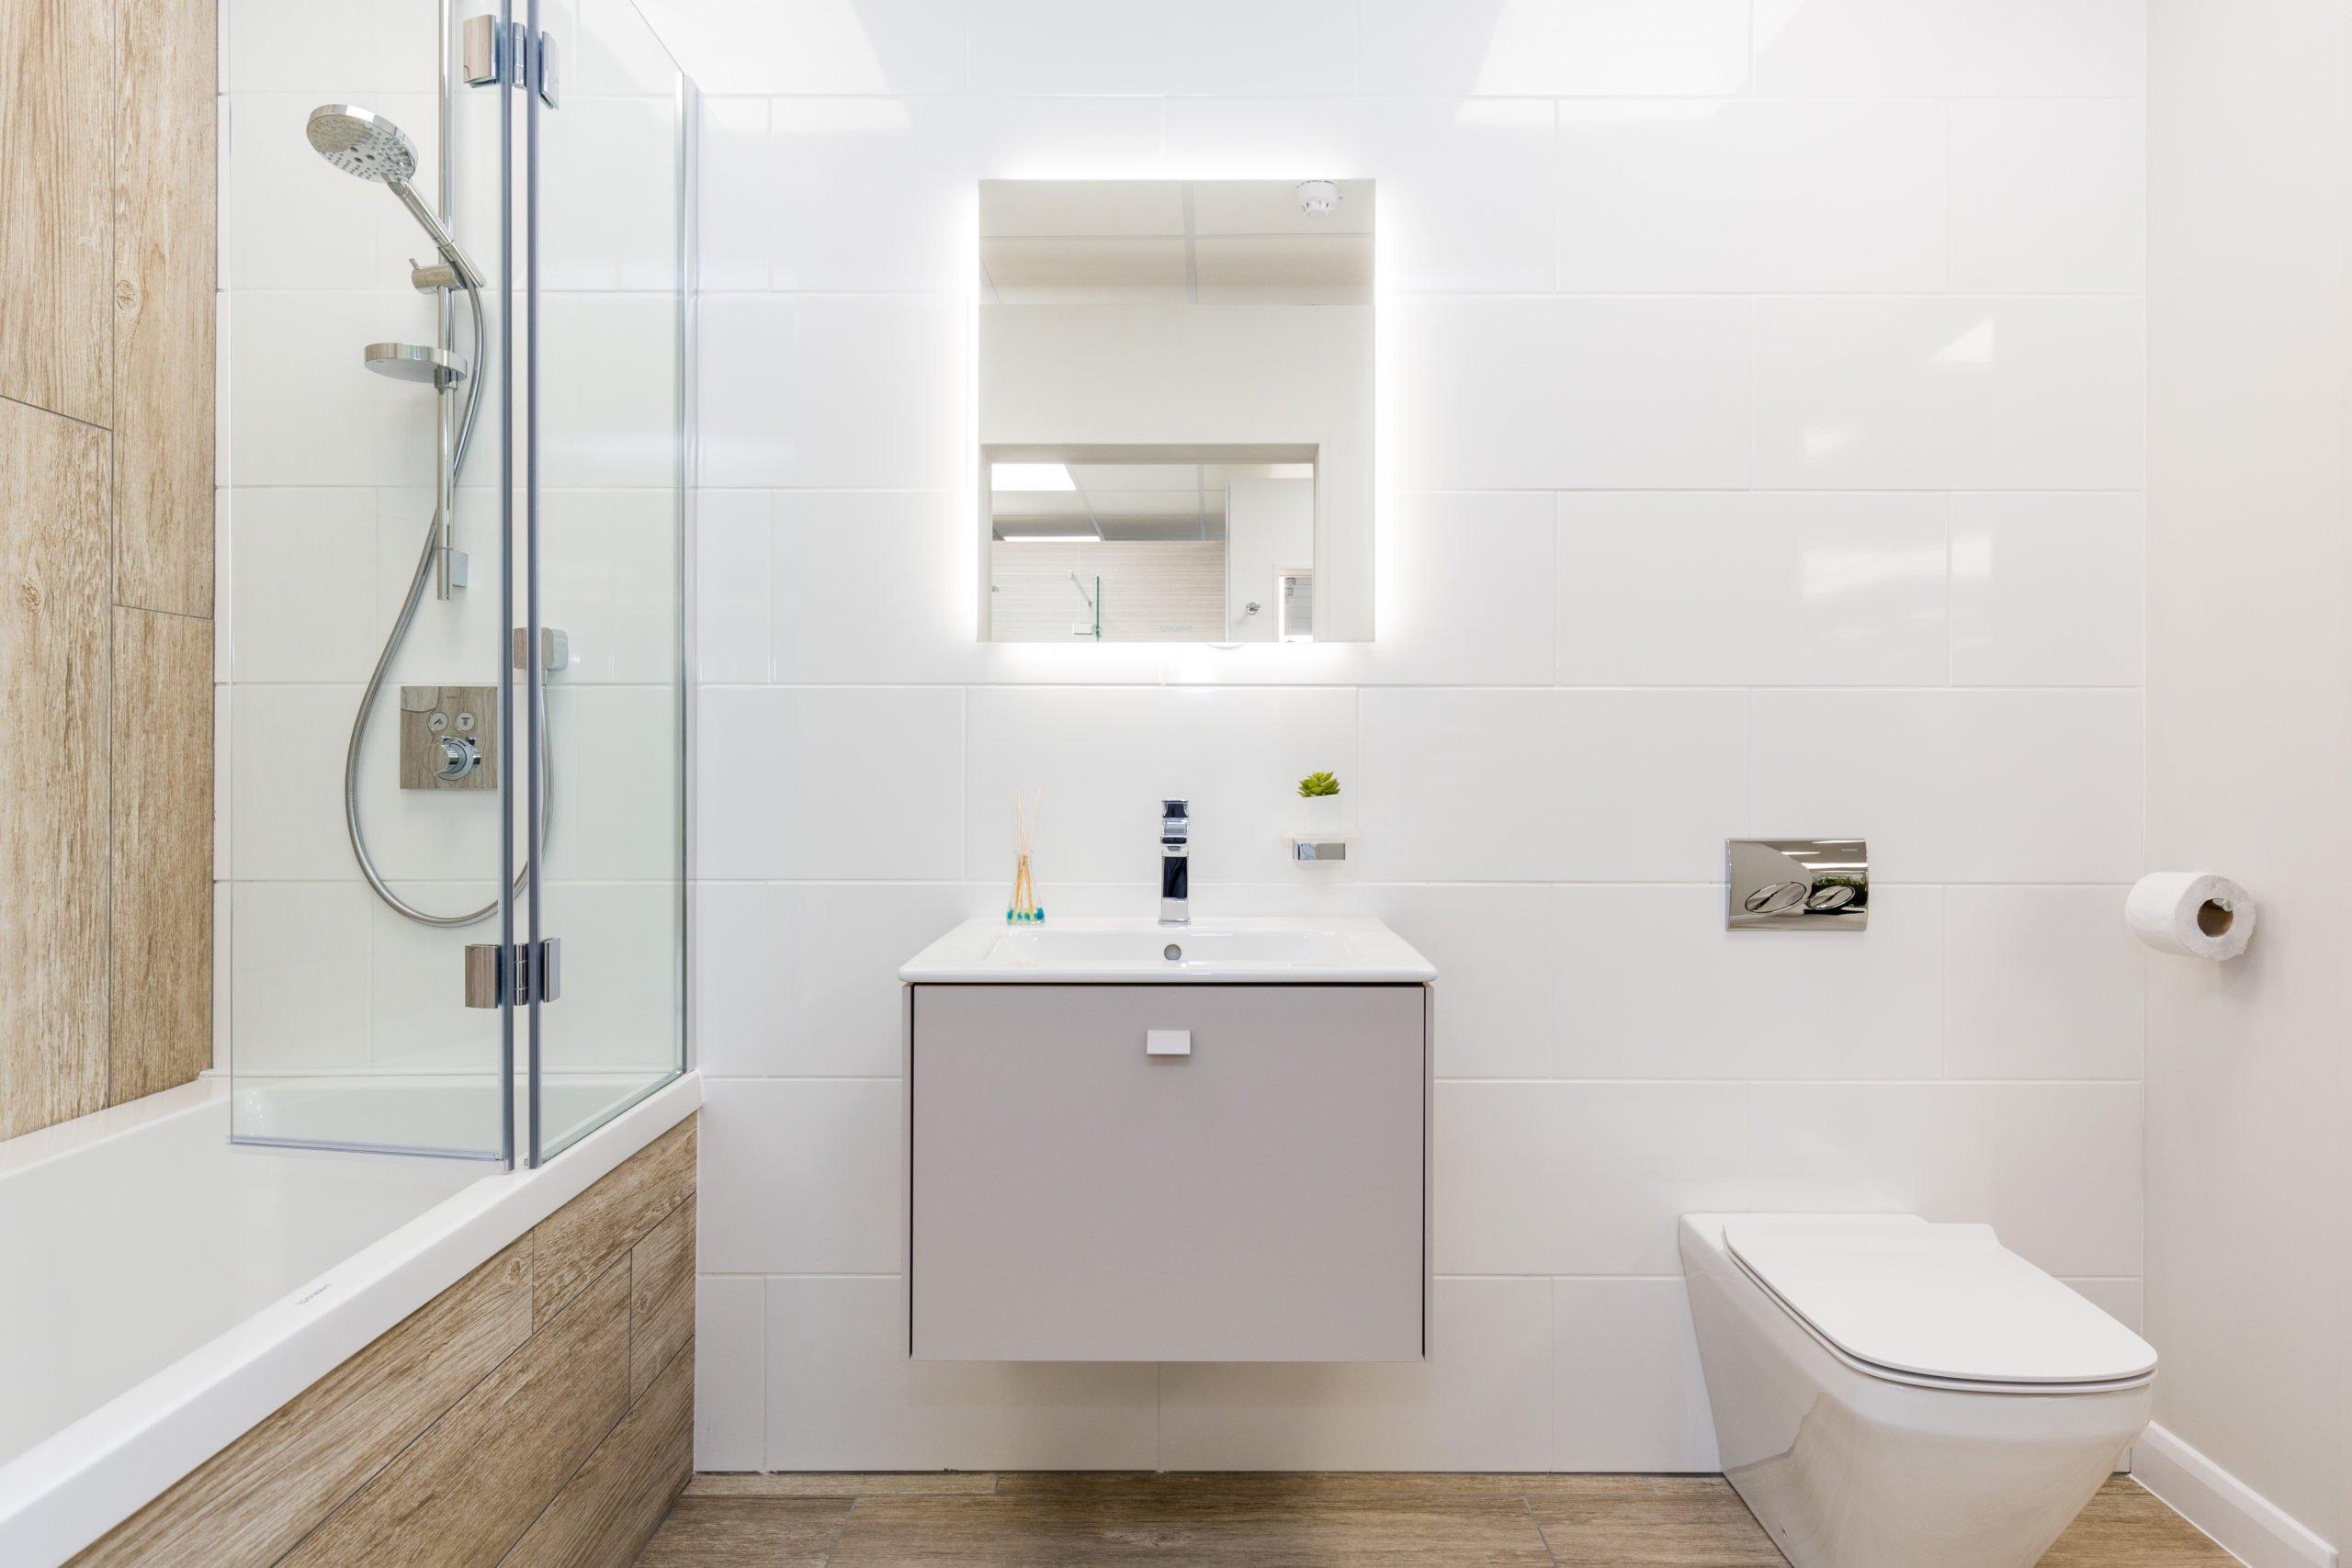 Sleek wall-hung vanity unit